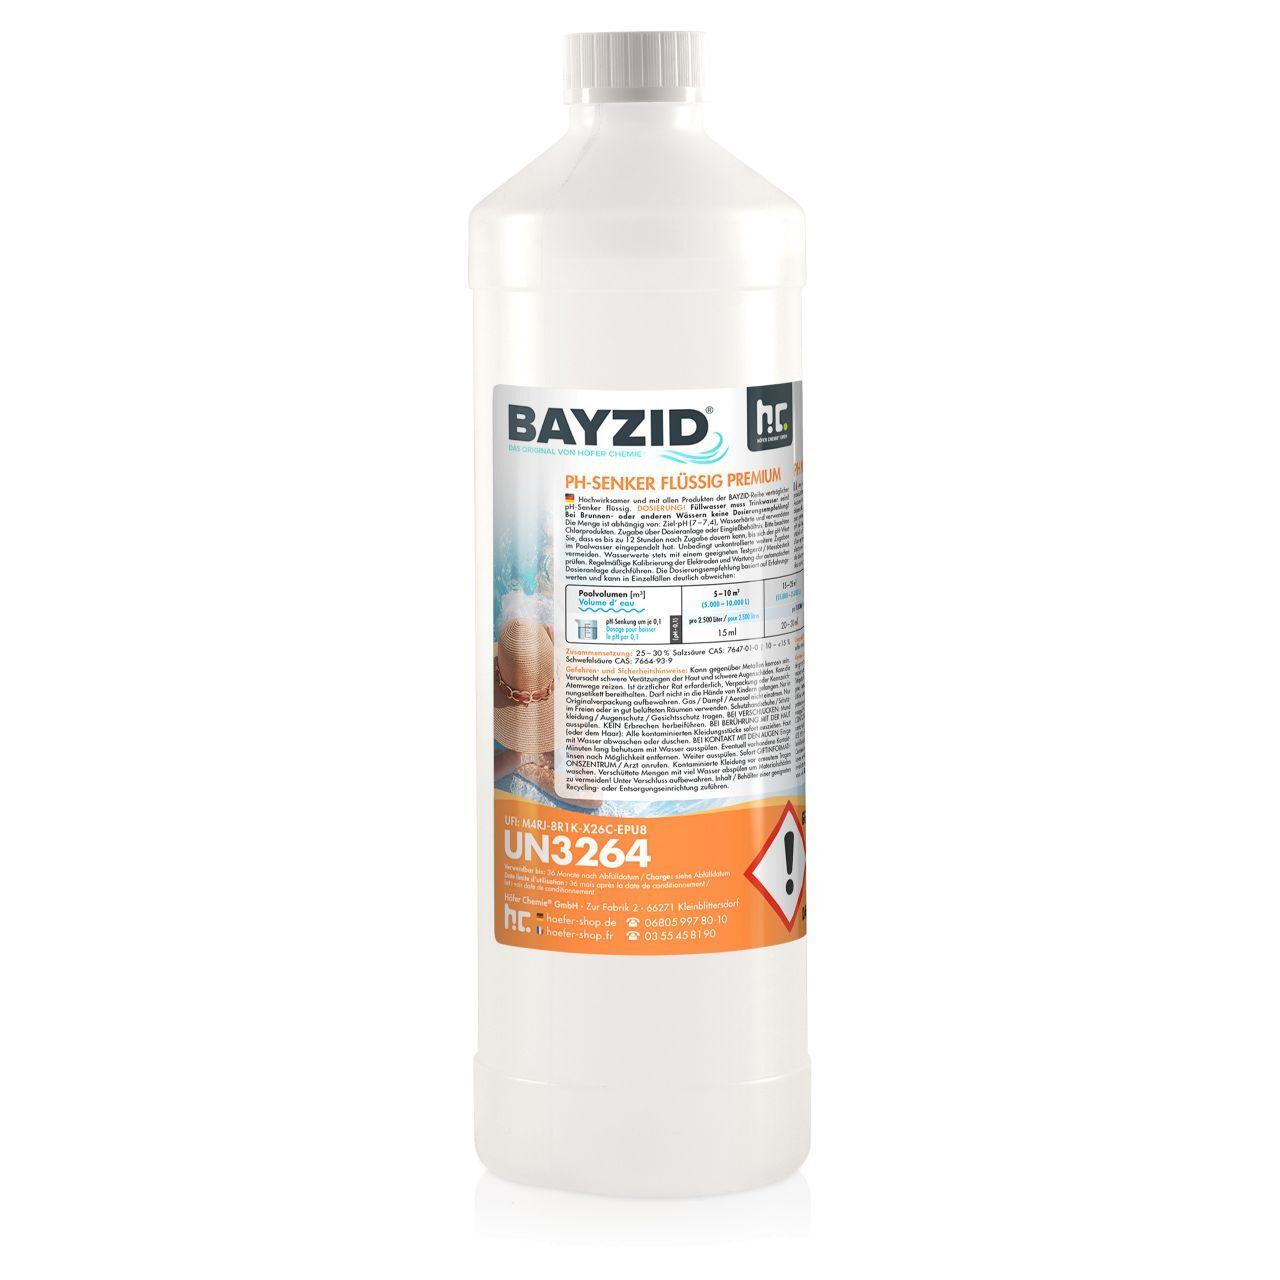 BAYZID 6 kg Bayzid® pH moins liquide (6 x 1 kg)